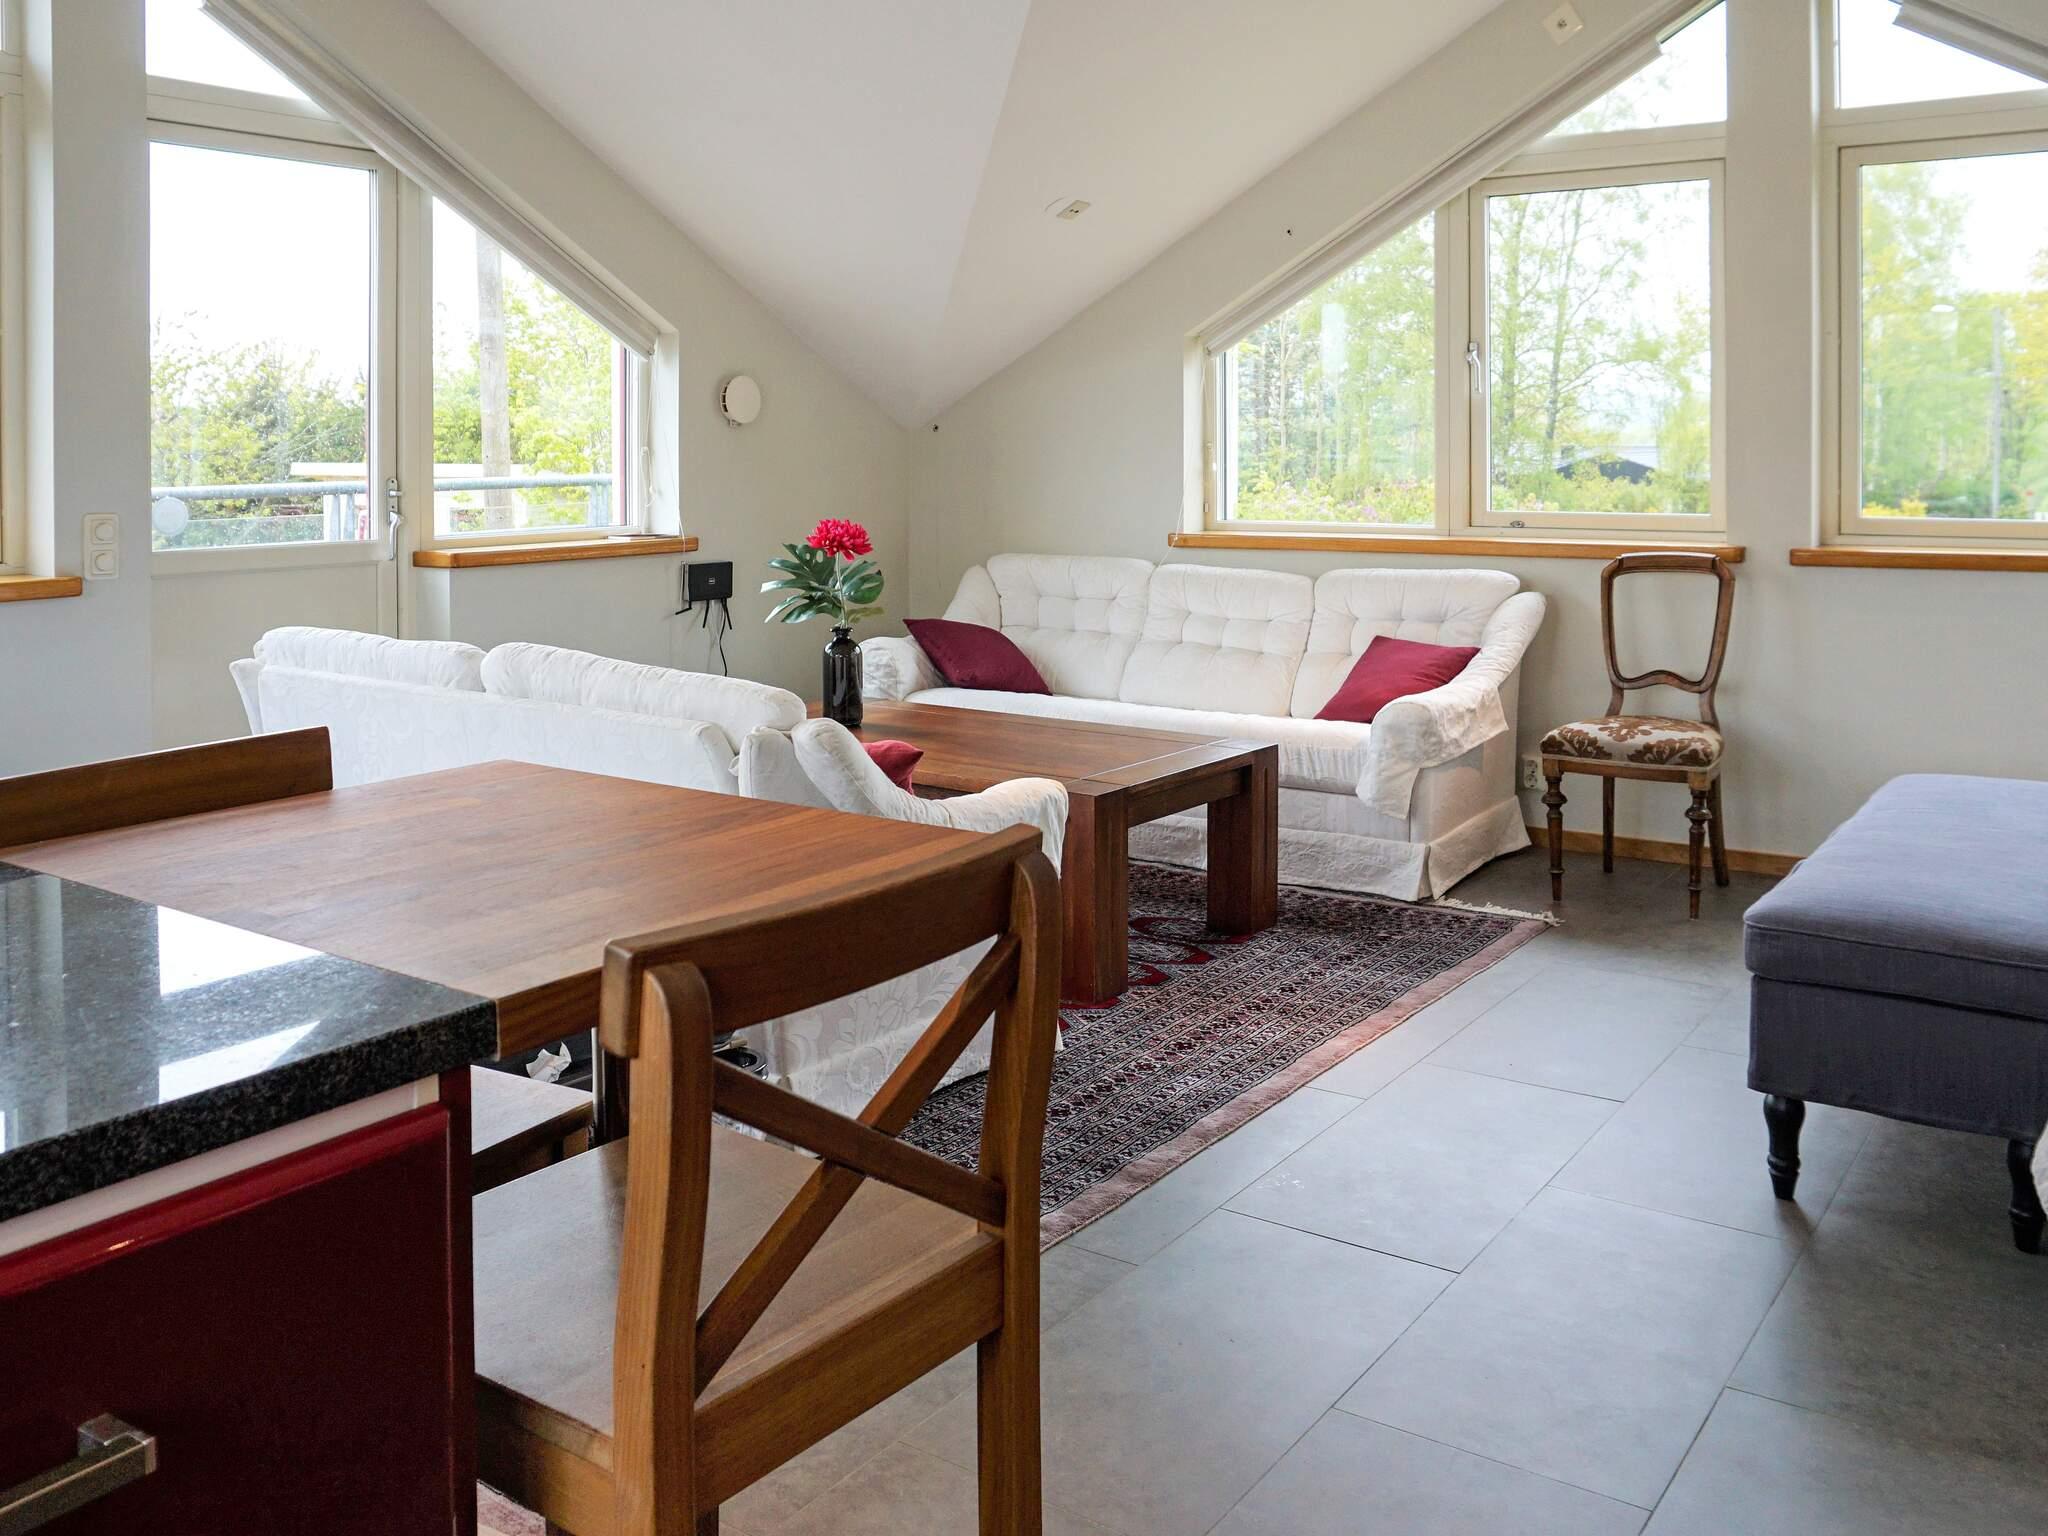 Ferienhaus Onsala (2619121), Onsala, Hallands län, Südschweden, Schweden, Bild 8